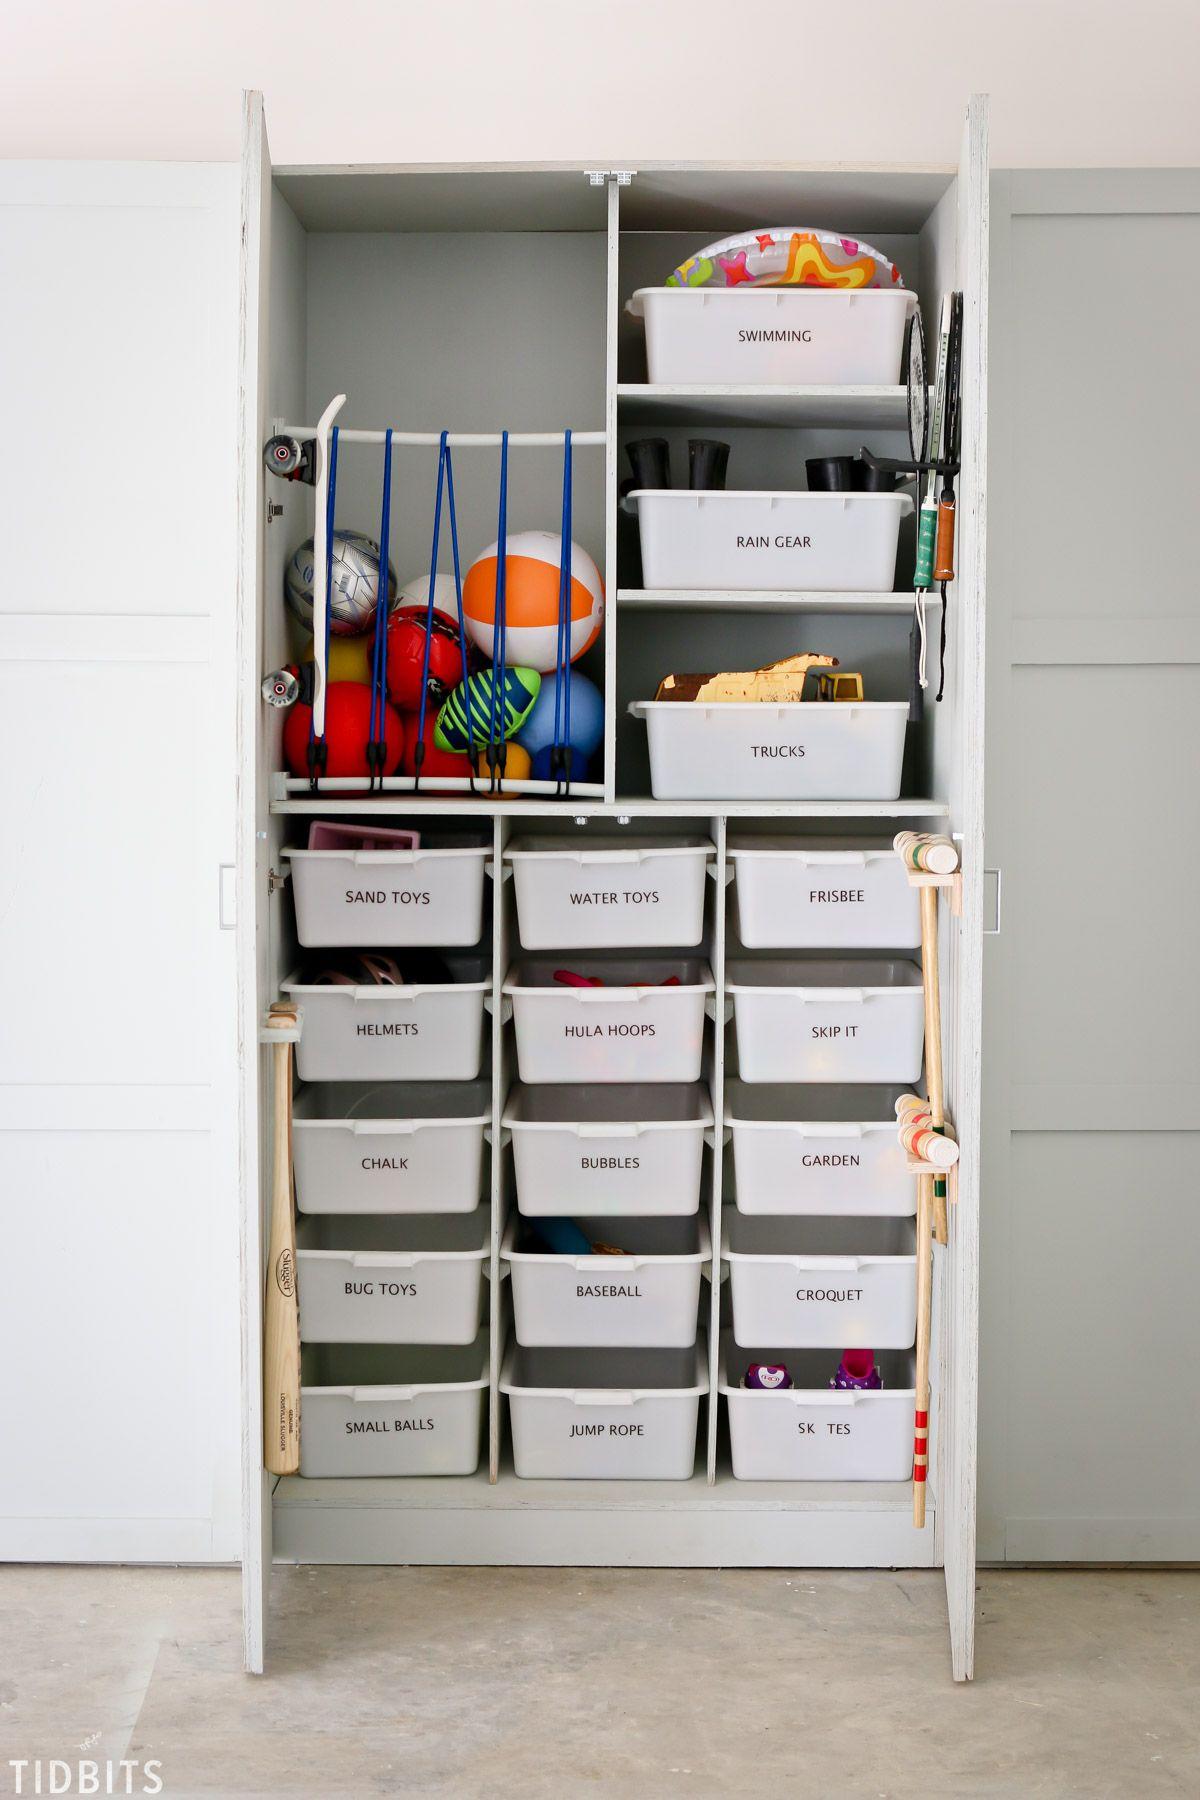 Garage Toy Storage & Organization - Tidbits